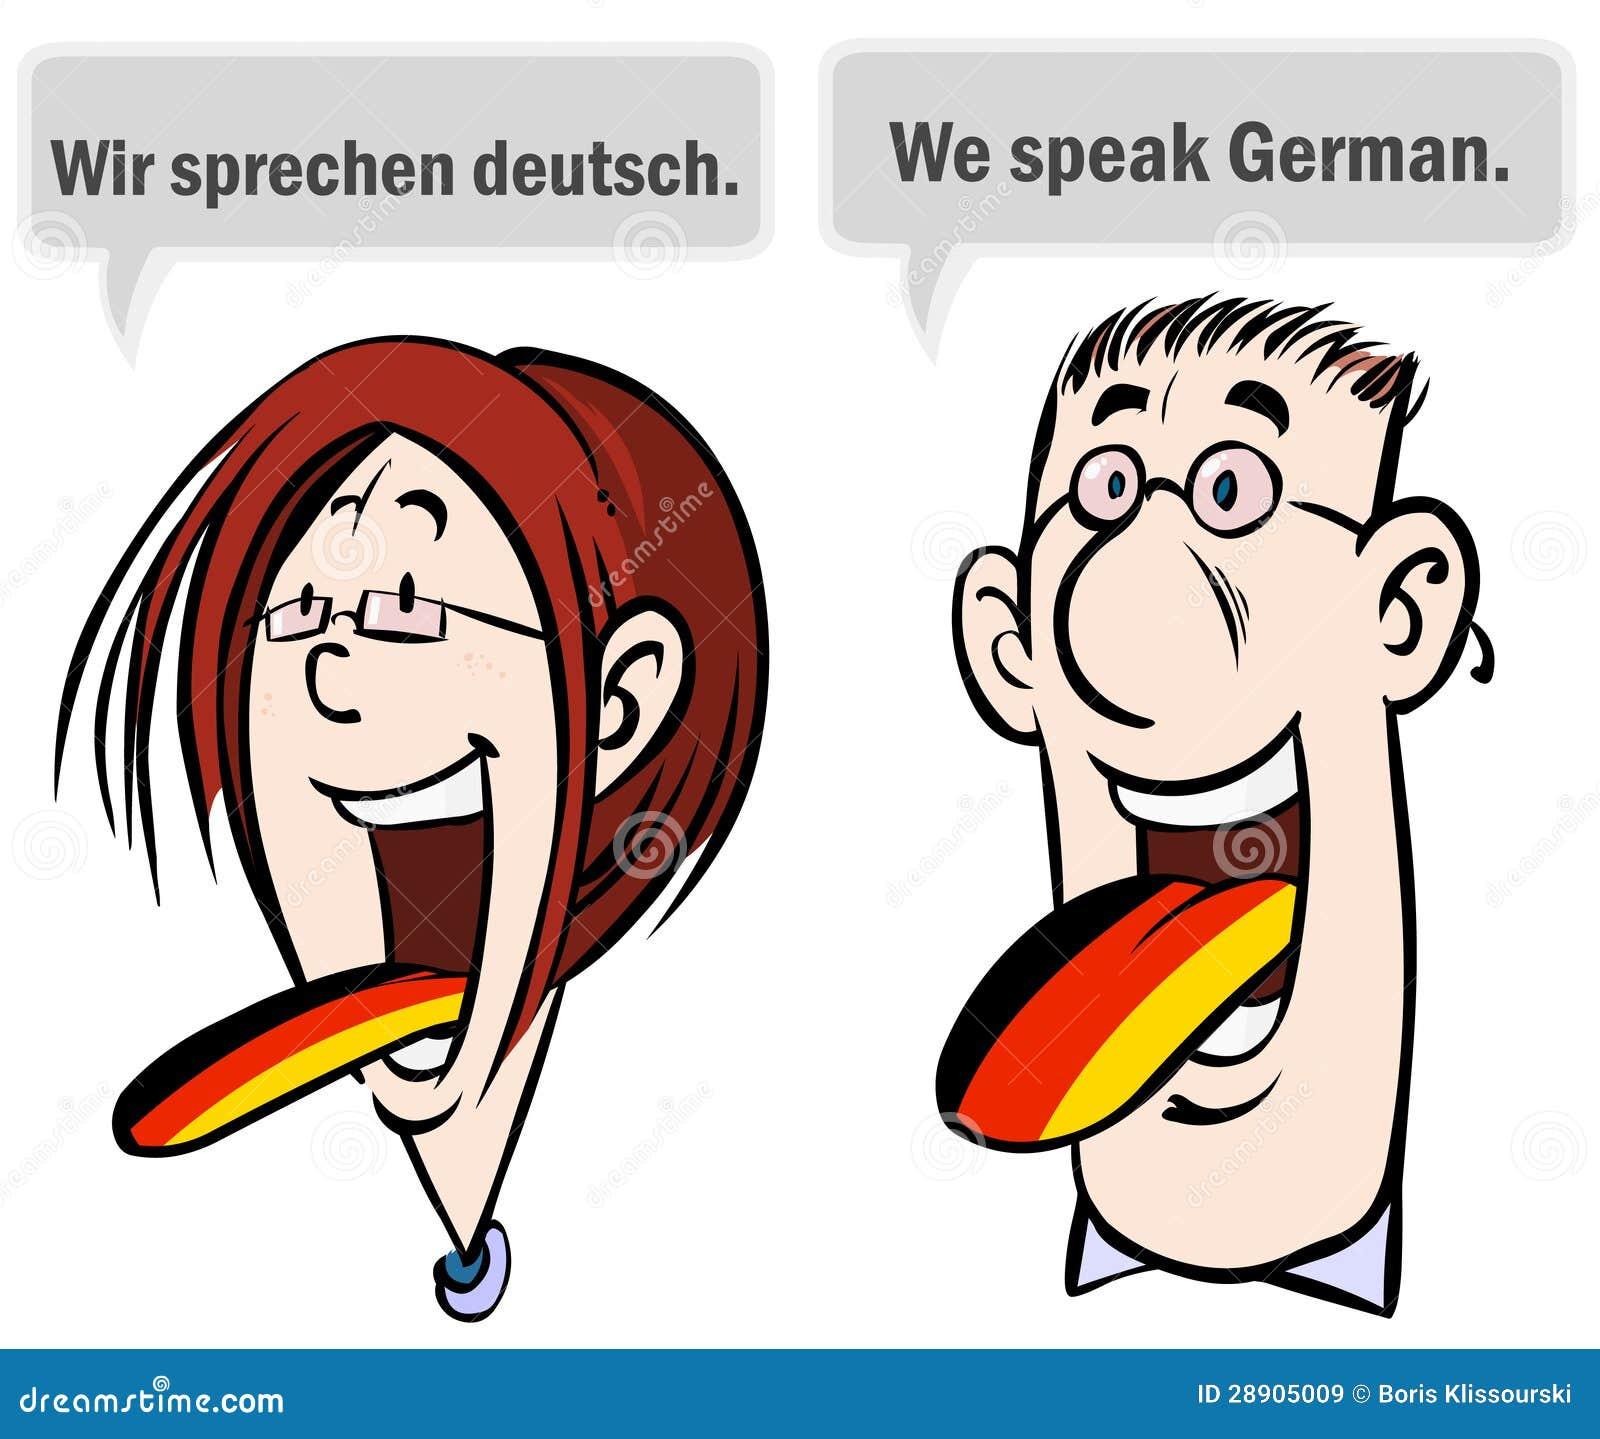 We Speak German. Royalty Free Stock Images - Image: 28905009